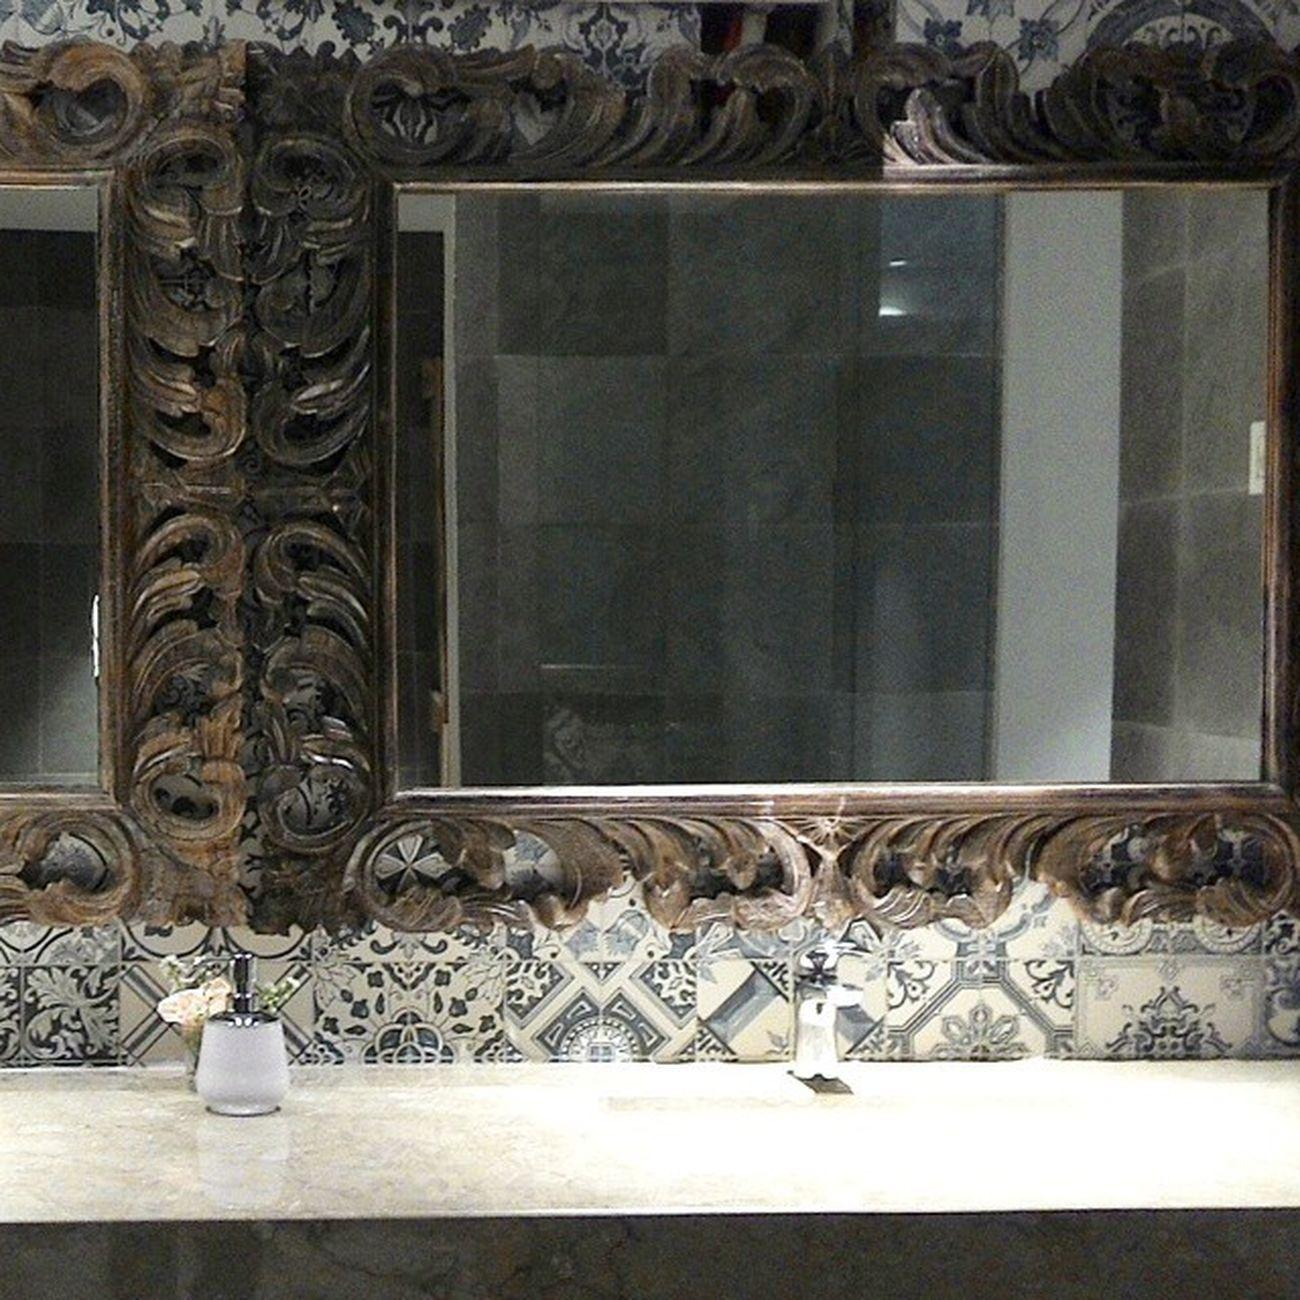 Make-up Room Fourpointsbali Fourpoints Kuta Bali Indonesia restroom mirror wooden crafts craftedwood marmer tiles elegant beautifuldestinations design interiordesign interior architecture homedecor hotels photooftheday